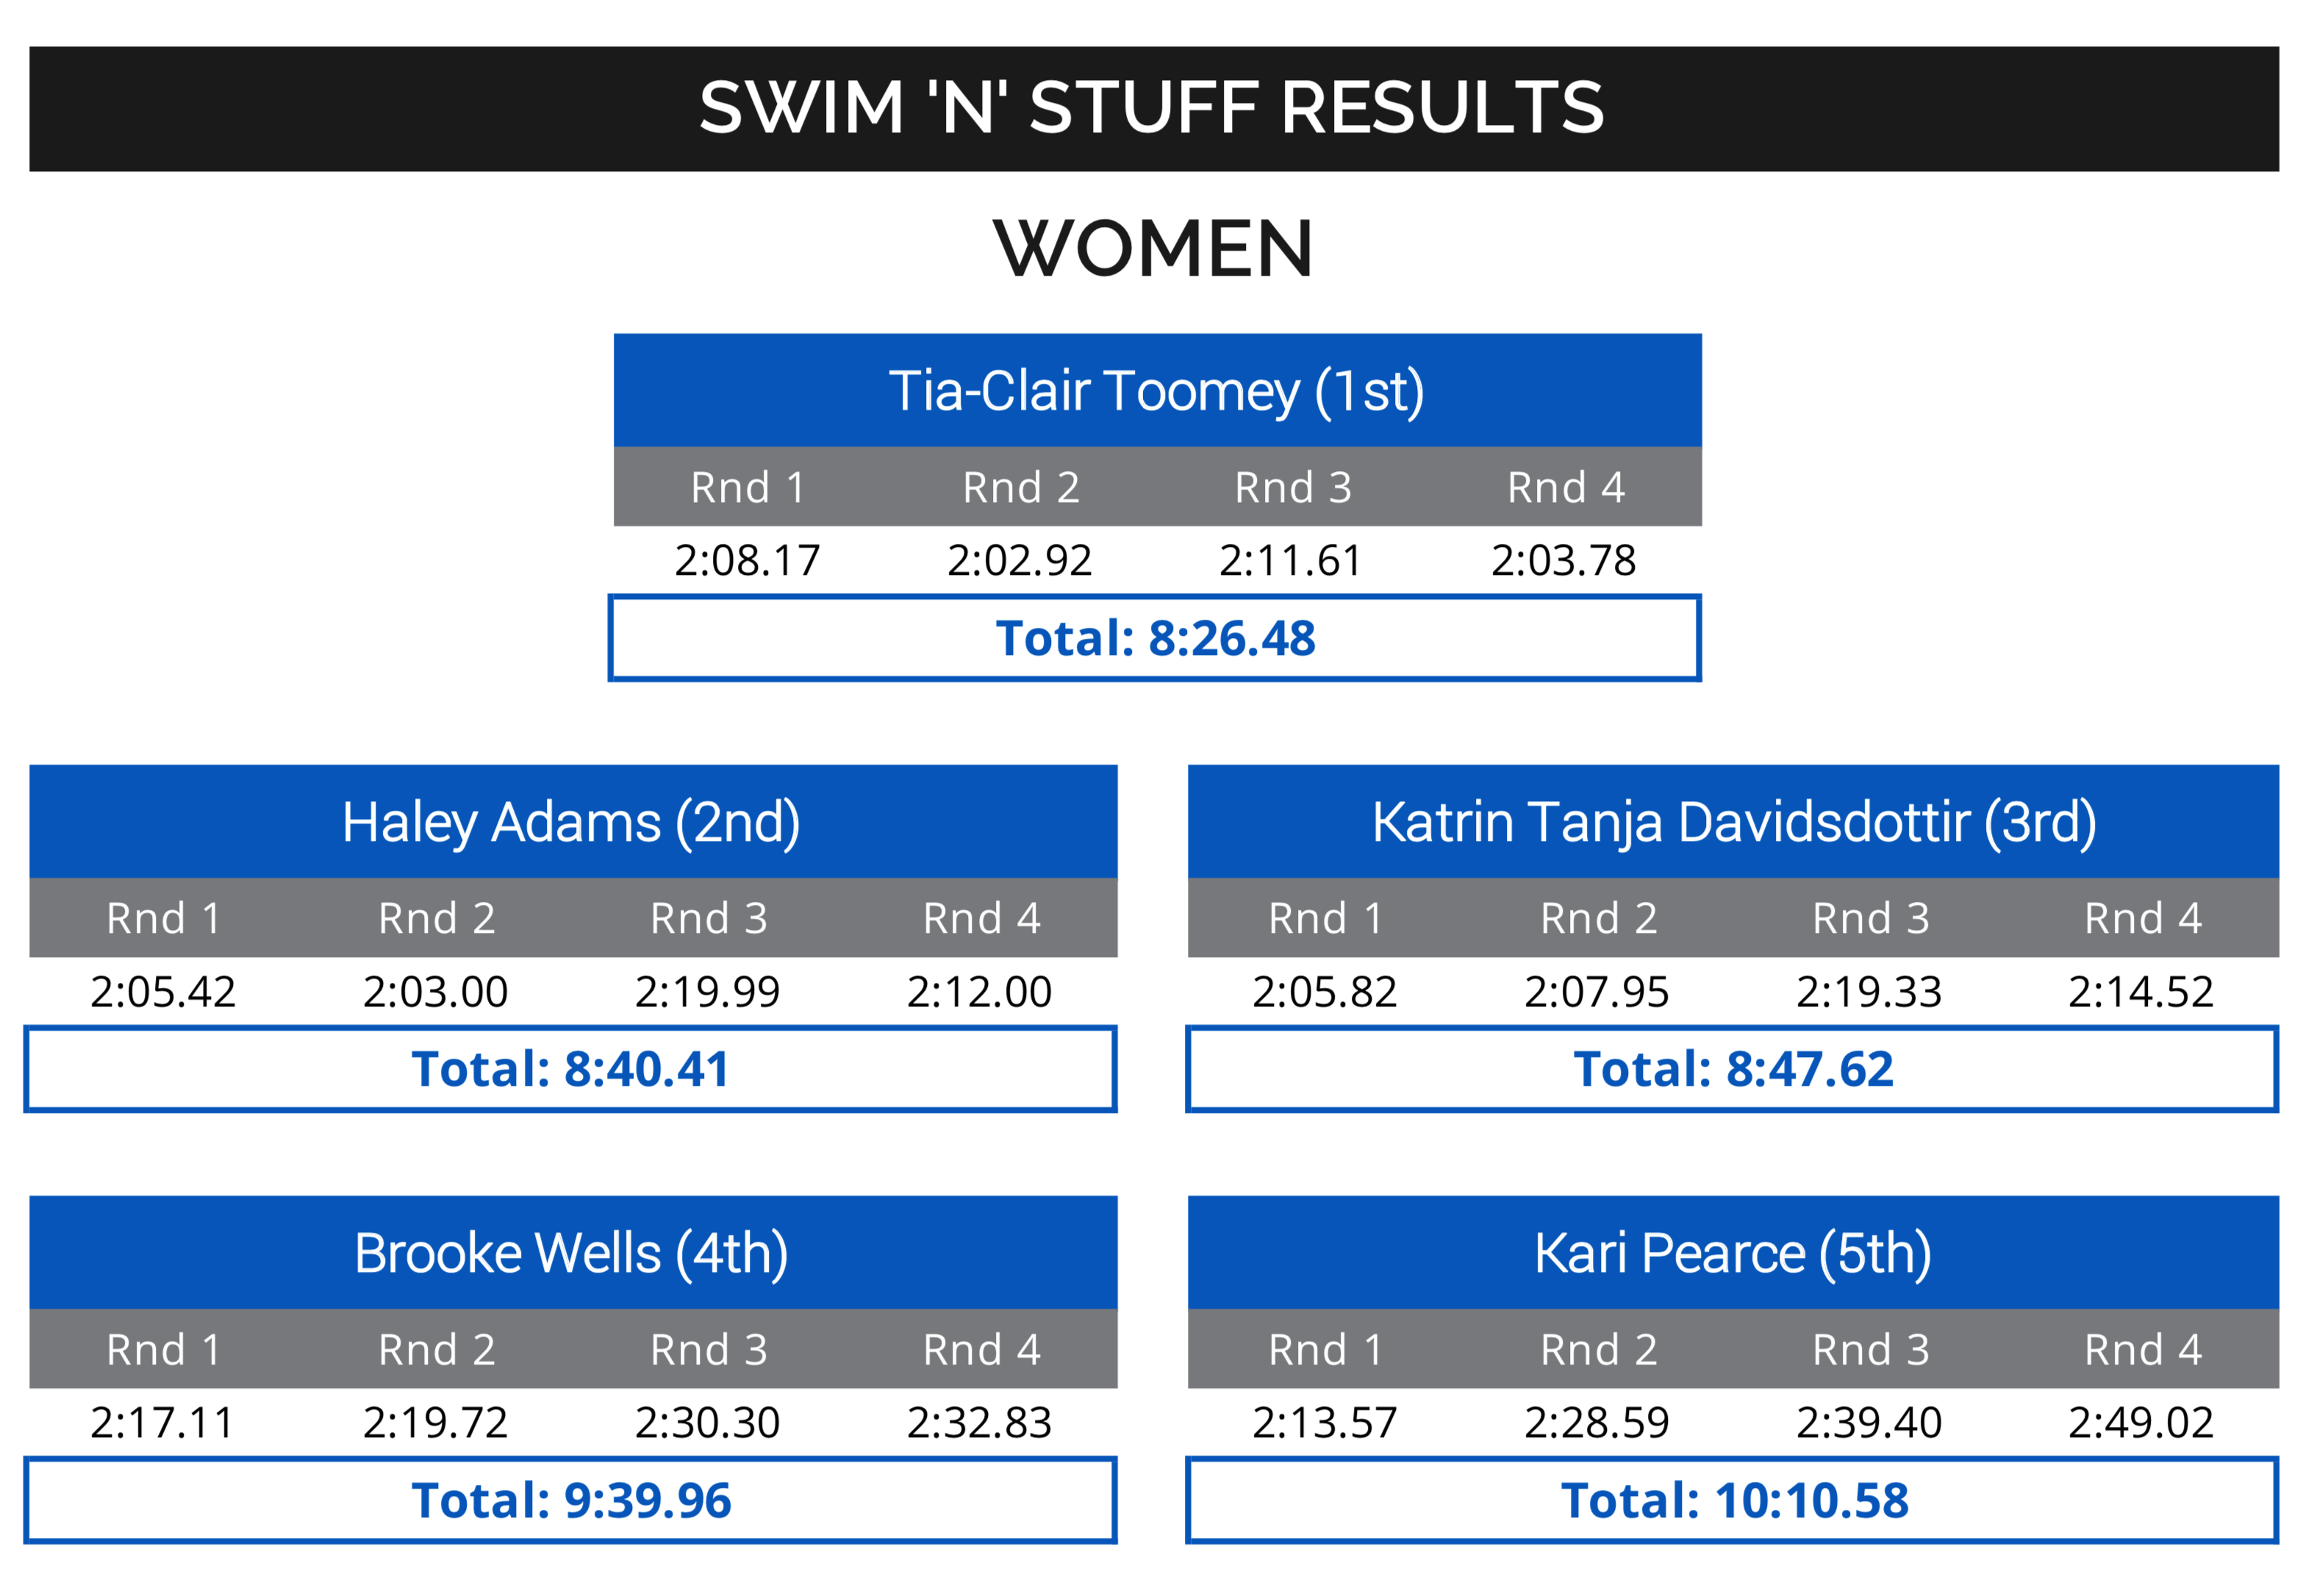 Women's Results